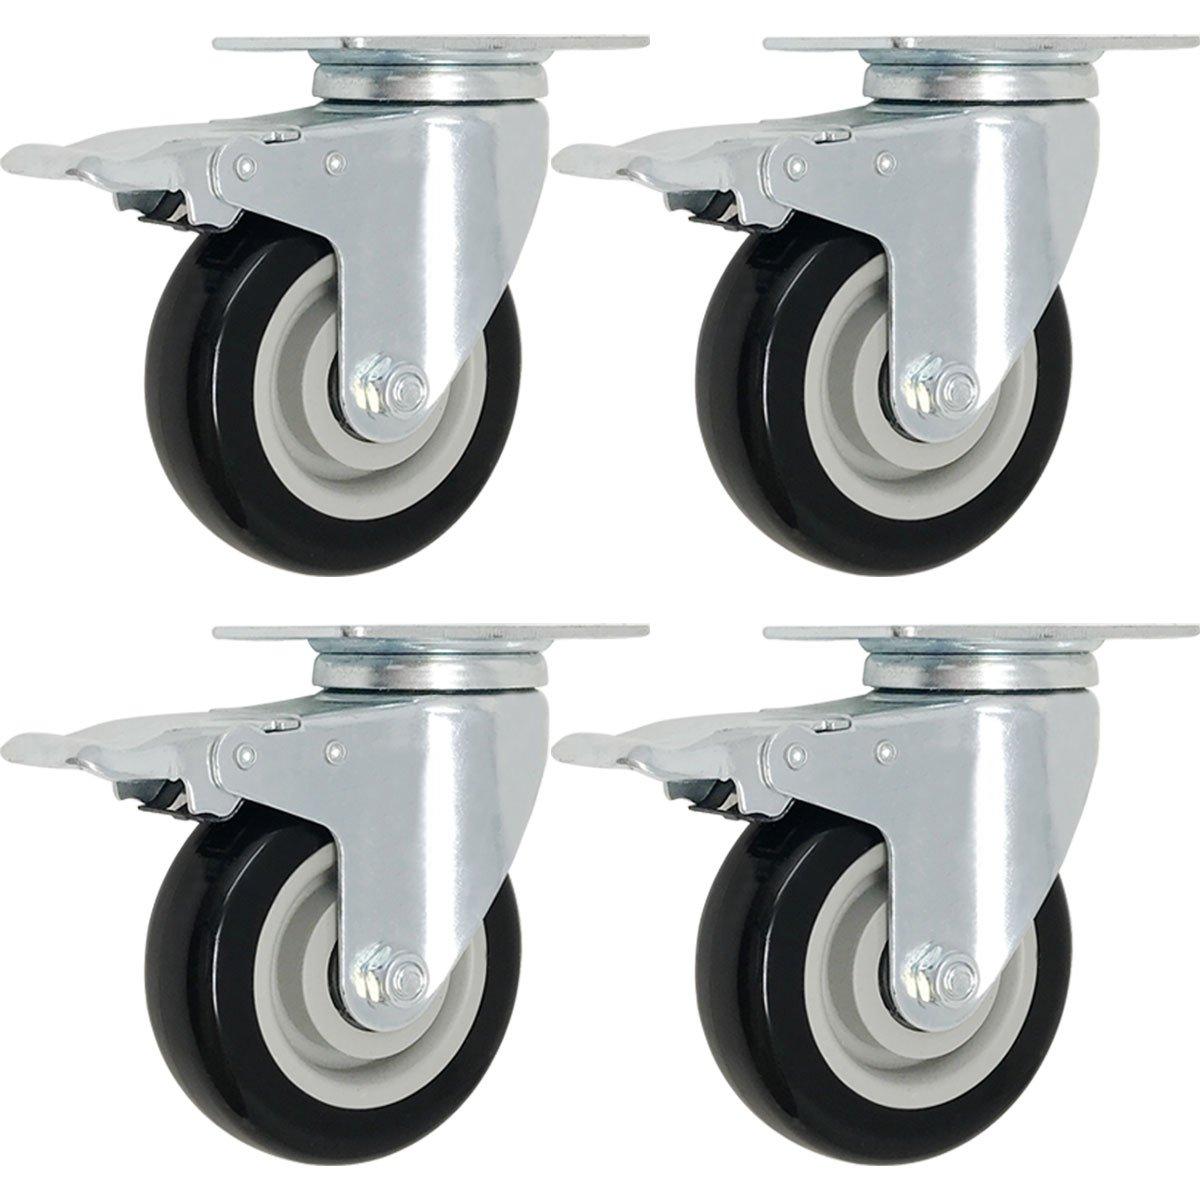 4 Pack Caster Wheels Swivel Plate w/ Break Casters On Black Polyurethane Wheels (5 inch with Brake)